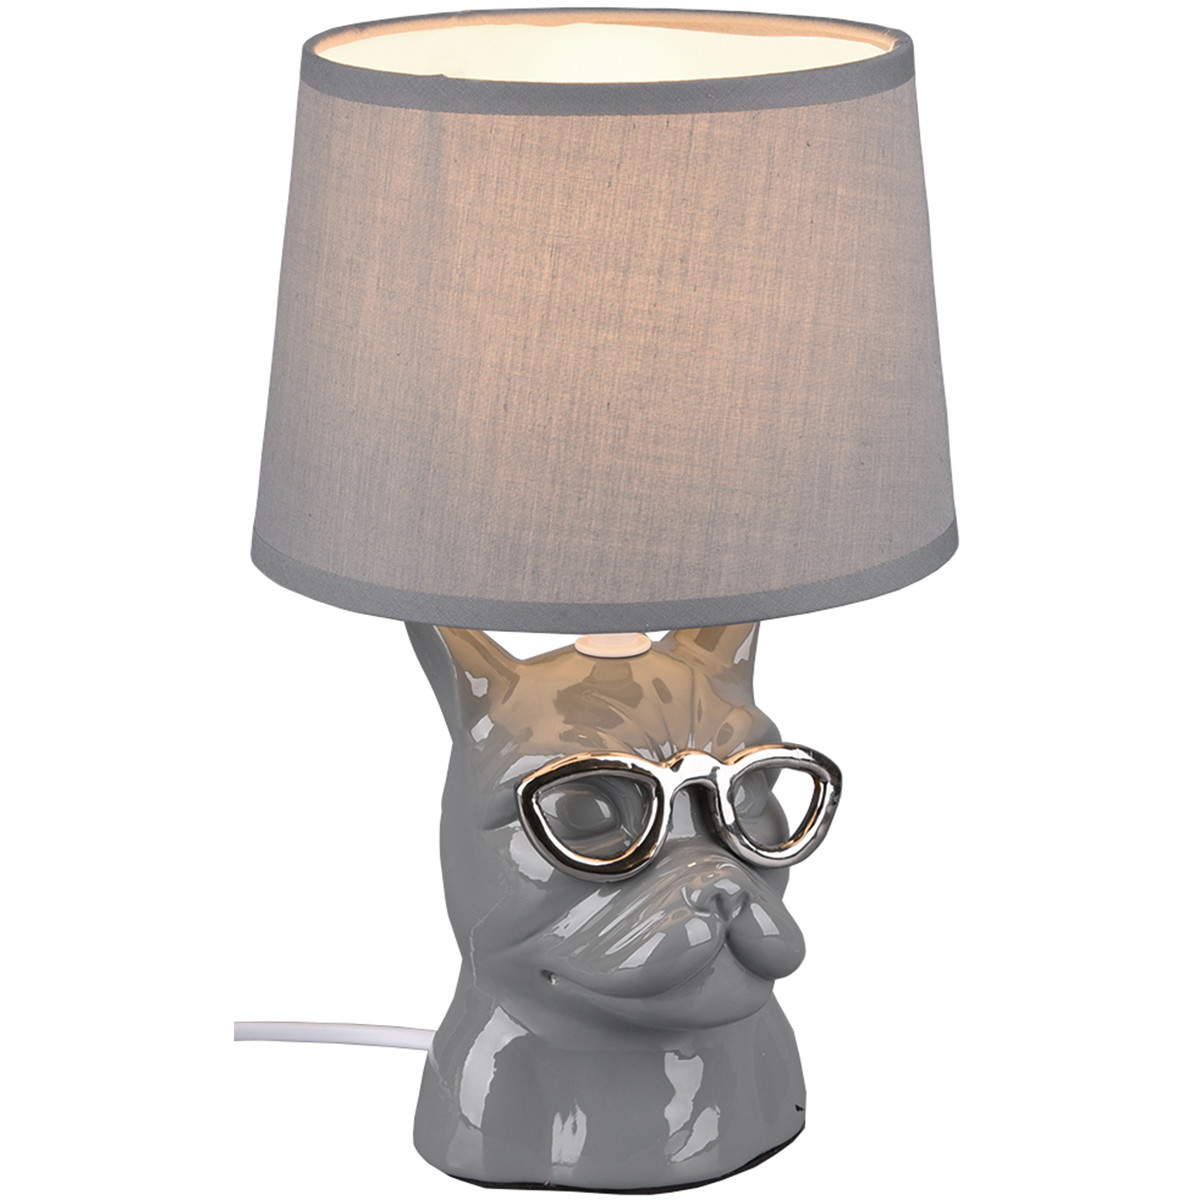 LED Tafellamp - Tafelverlichting - Trion Domino - E14 Fitting - Rond - Mat Grijs - Keramiek